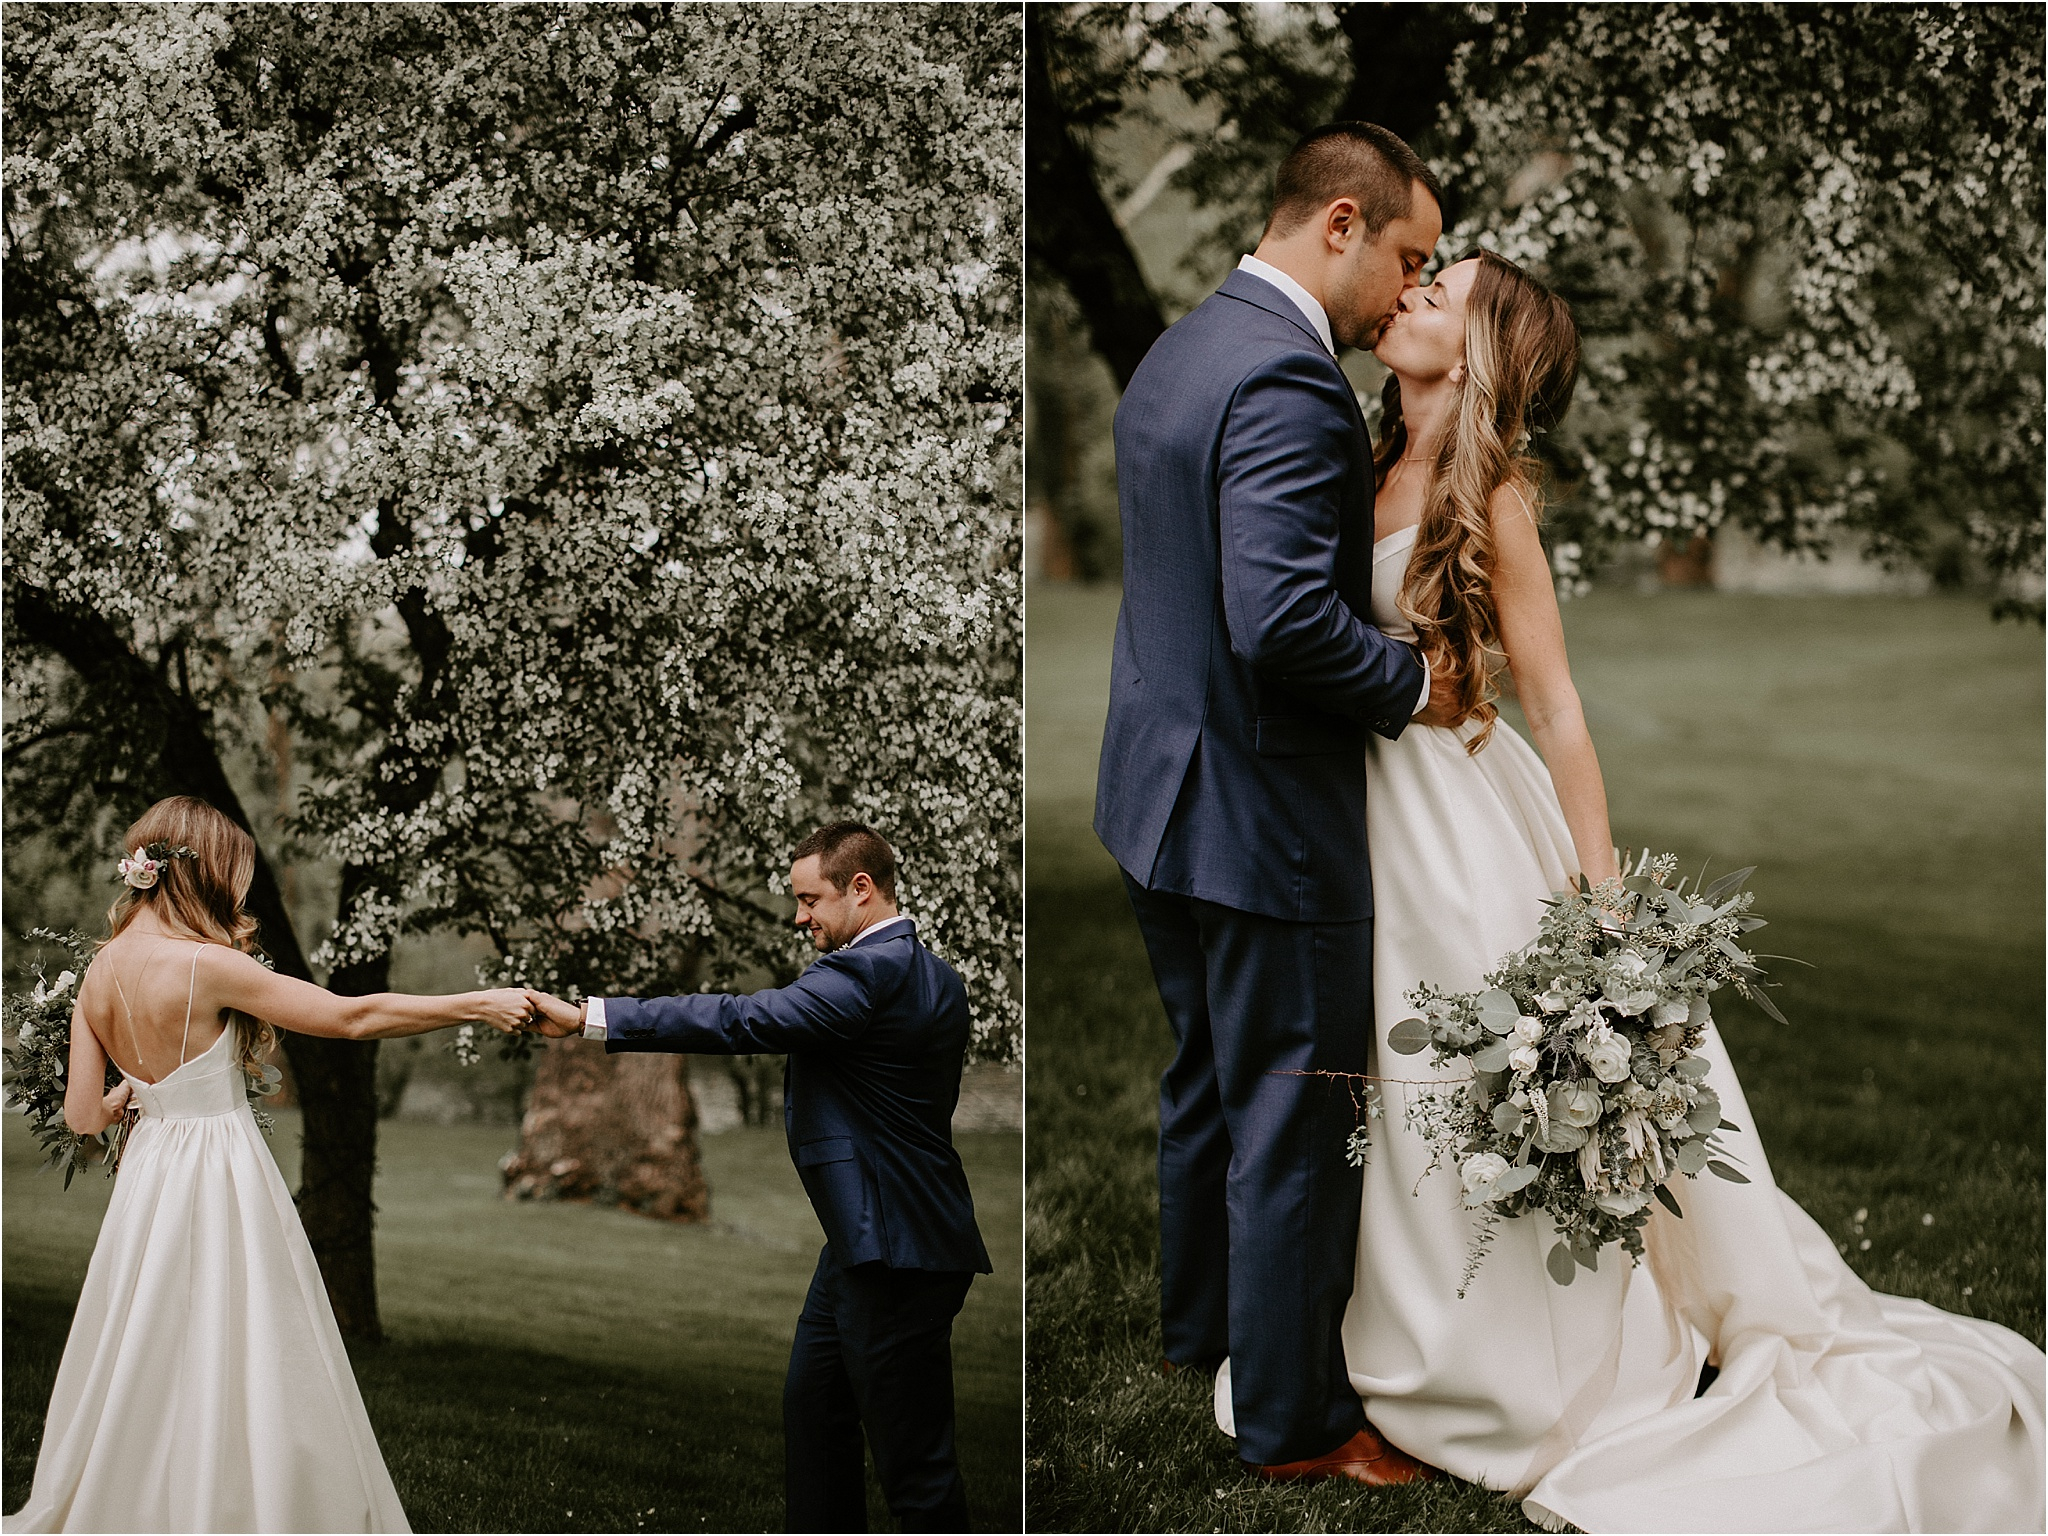 Sarah_Brookhart_Lancaster_PA_Wedding_Photographer_0023.jpg